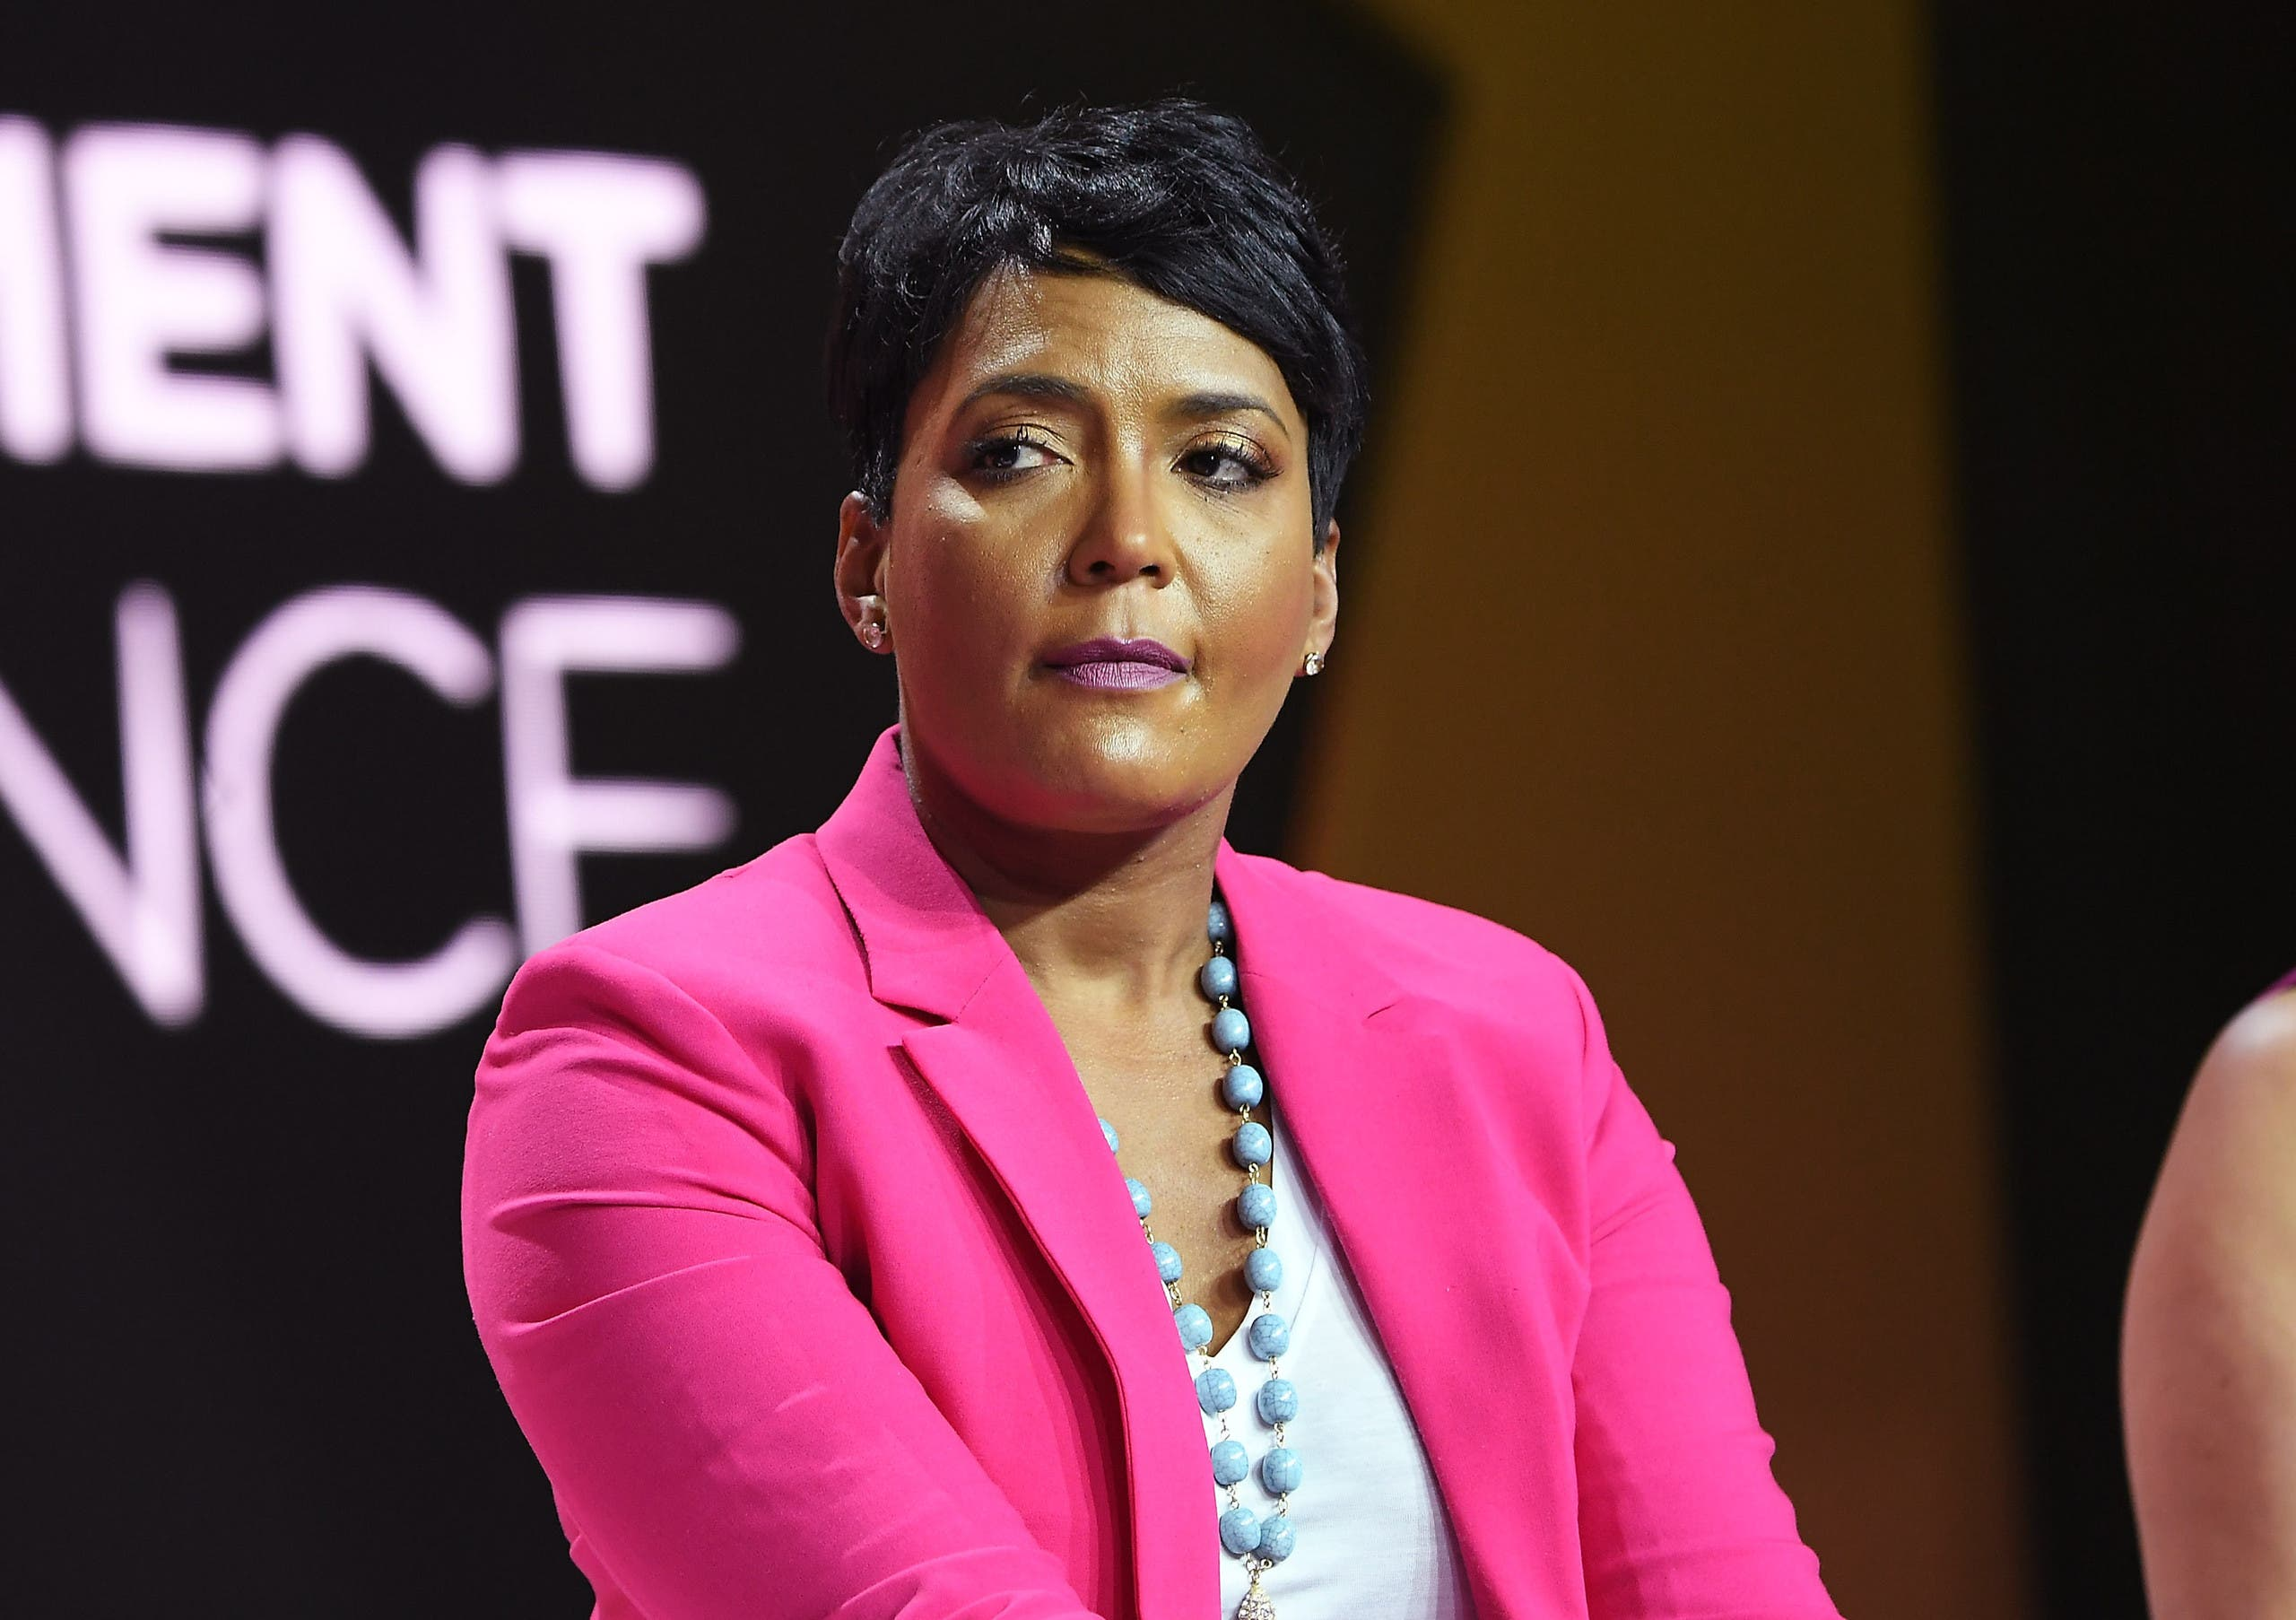 Mayor of Atlanta Keisha Lance Bottoms speaks onstage, July 6, 2018. (AFP)